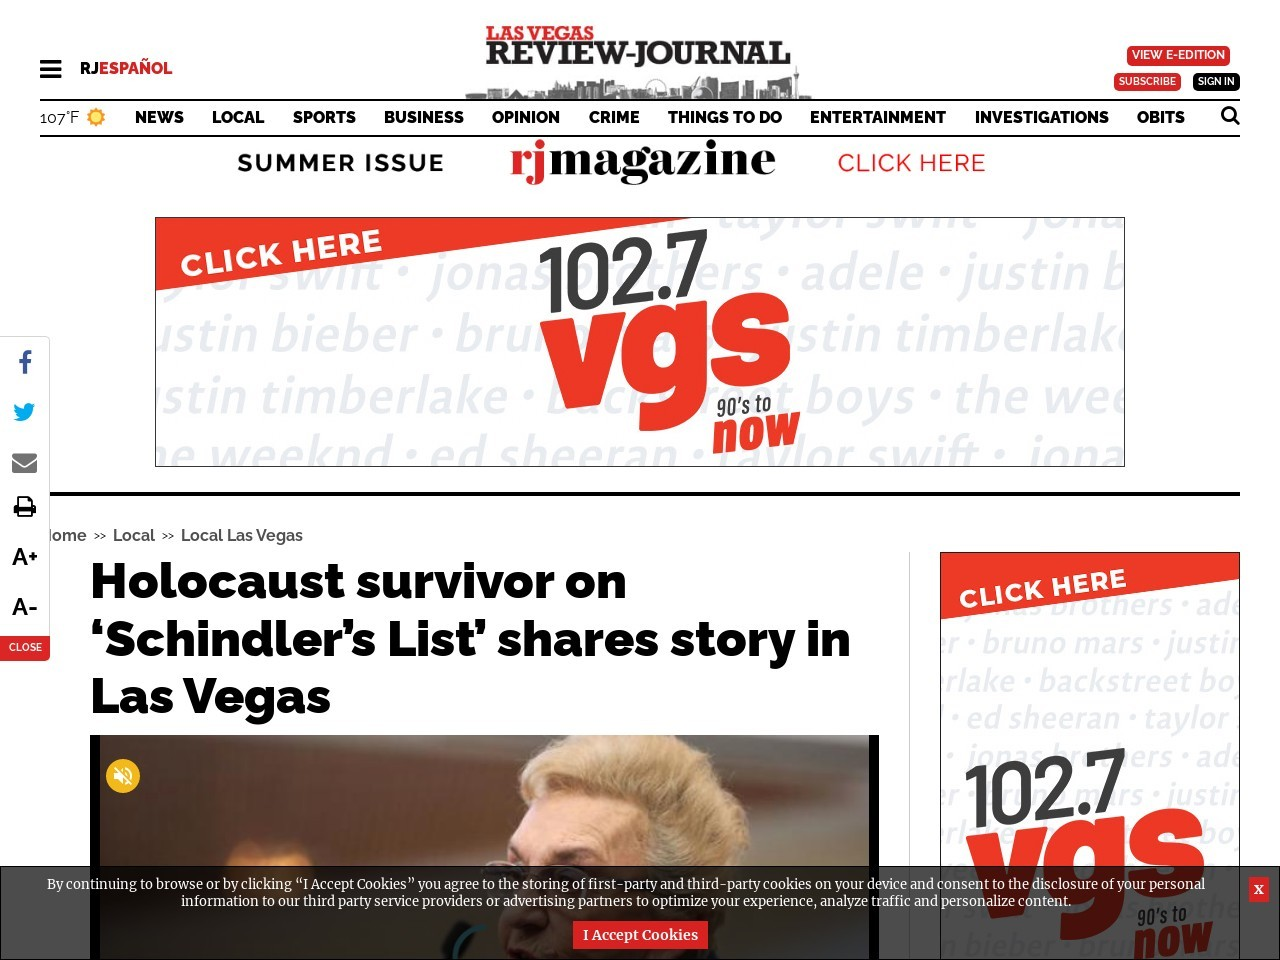 Holocaust survivor on 'Schindler's List' shares story in Las Vegas